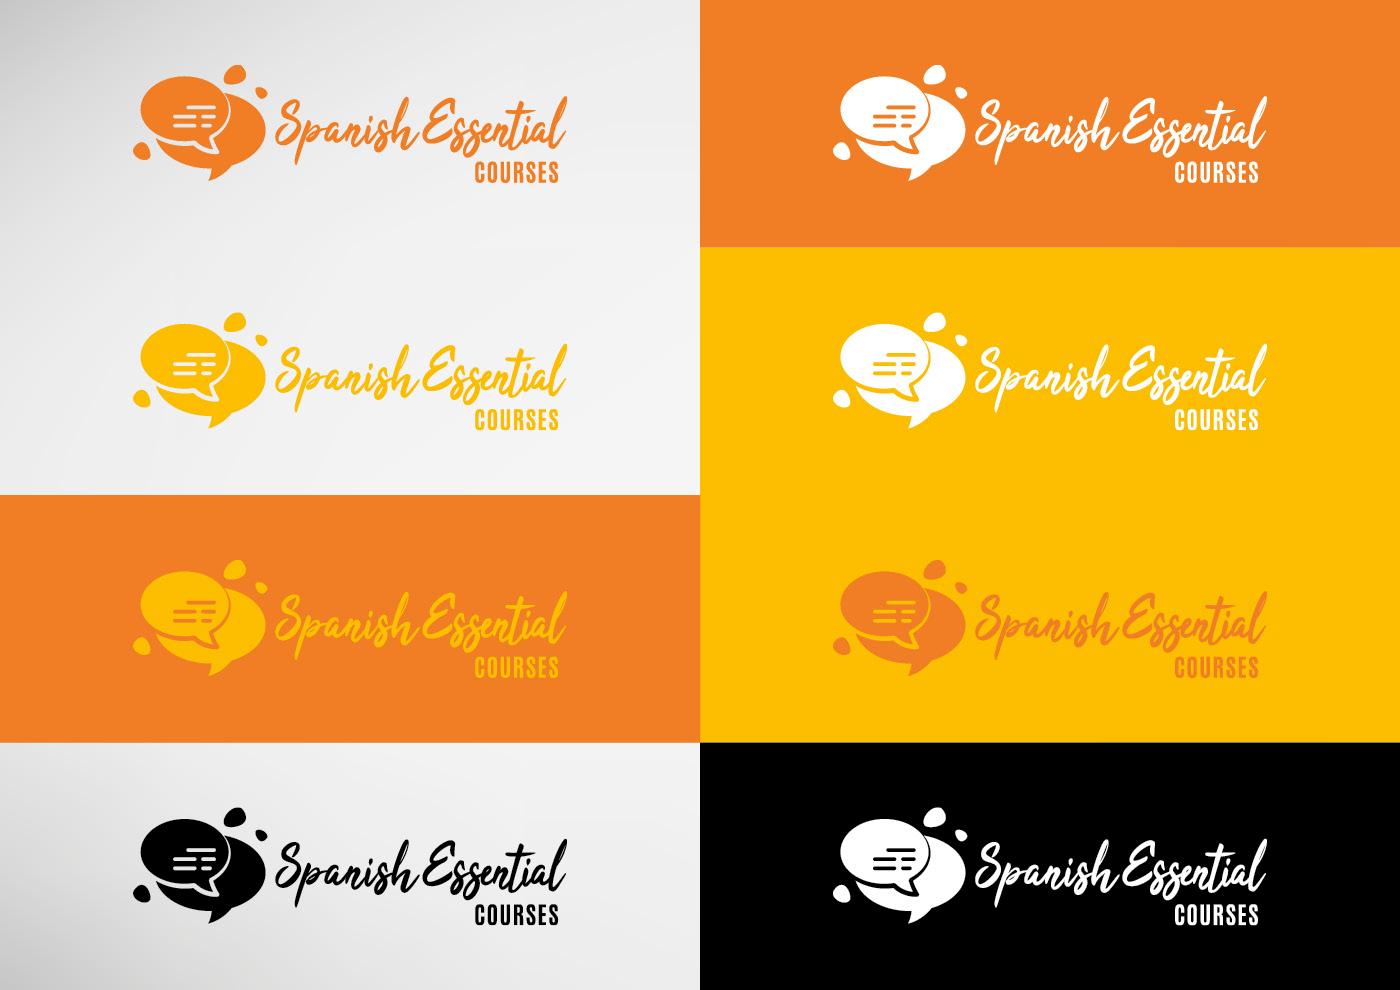 Spanish Essential - Imagen corporativa - Ivan Diez